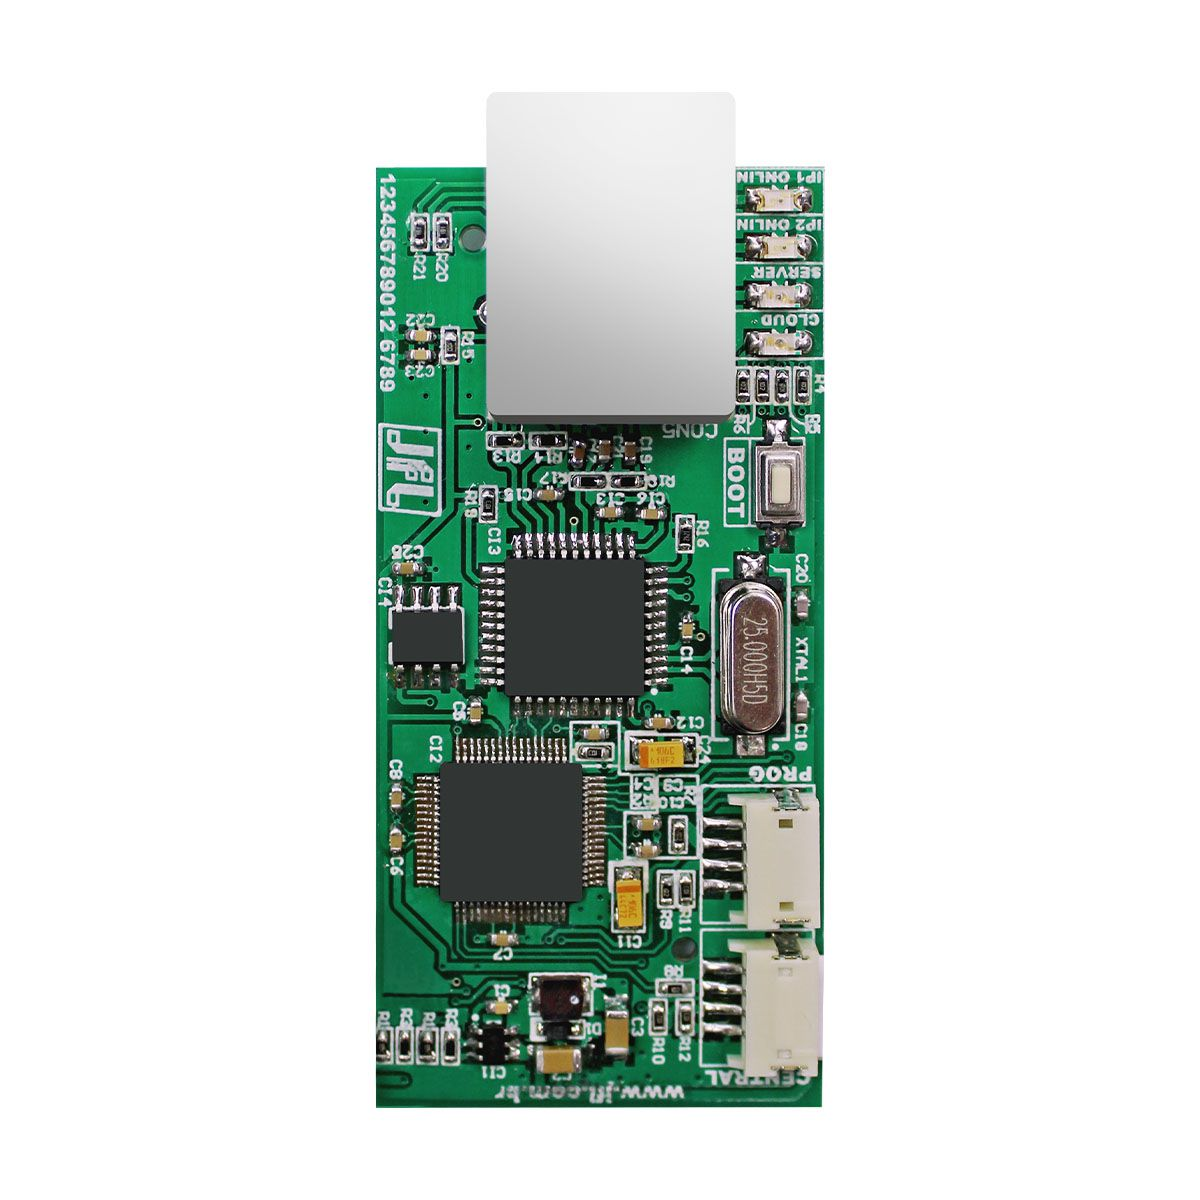 Kit Alarme e Cerca Elétrica Ecr 18 Plus Jfl Acesso via App